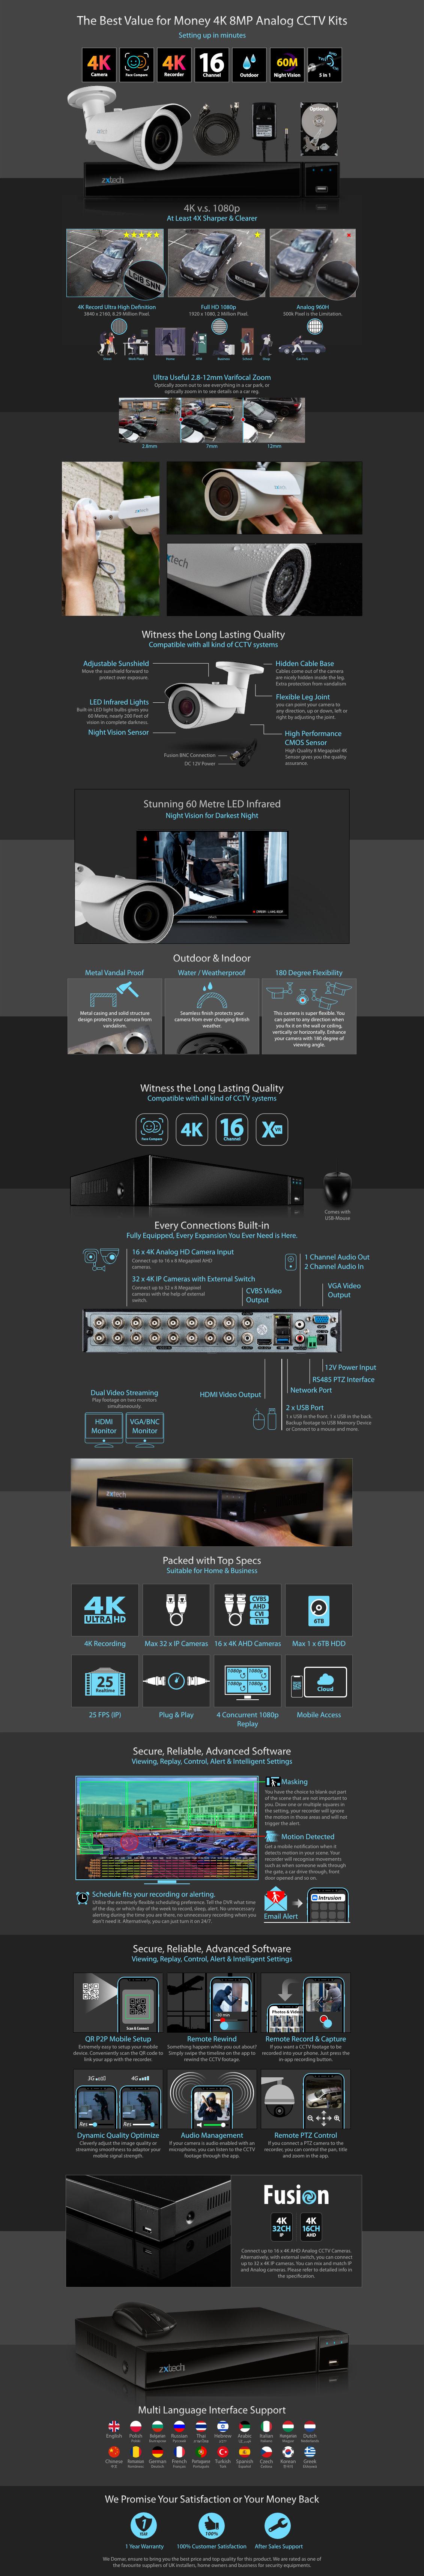 Zxtech 10x 8MP 4K-Lite UHD 60M Night Vision 2.8-12mm Varifocal Bullet Cameras 16CH DVR CCTV Kit | AX10F16X